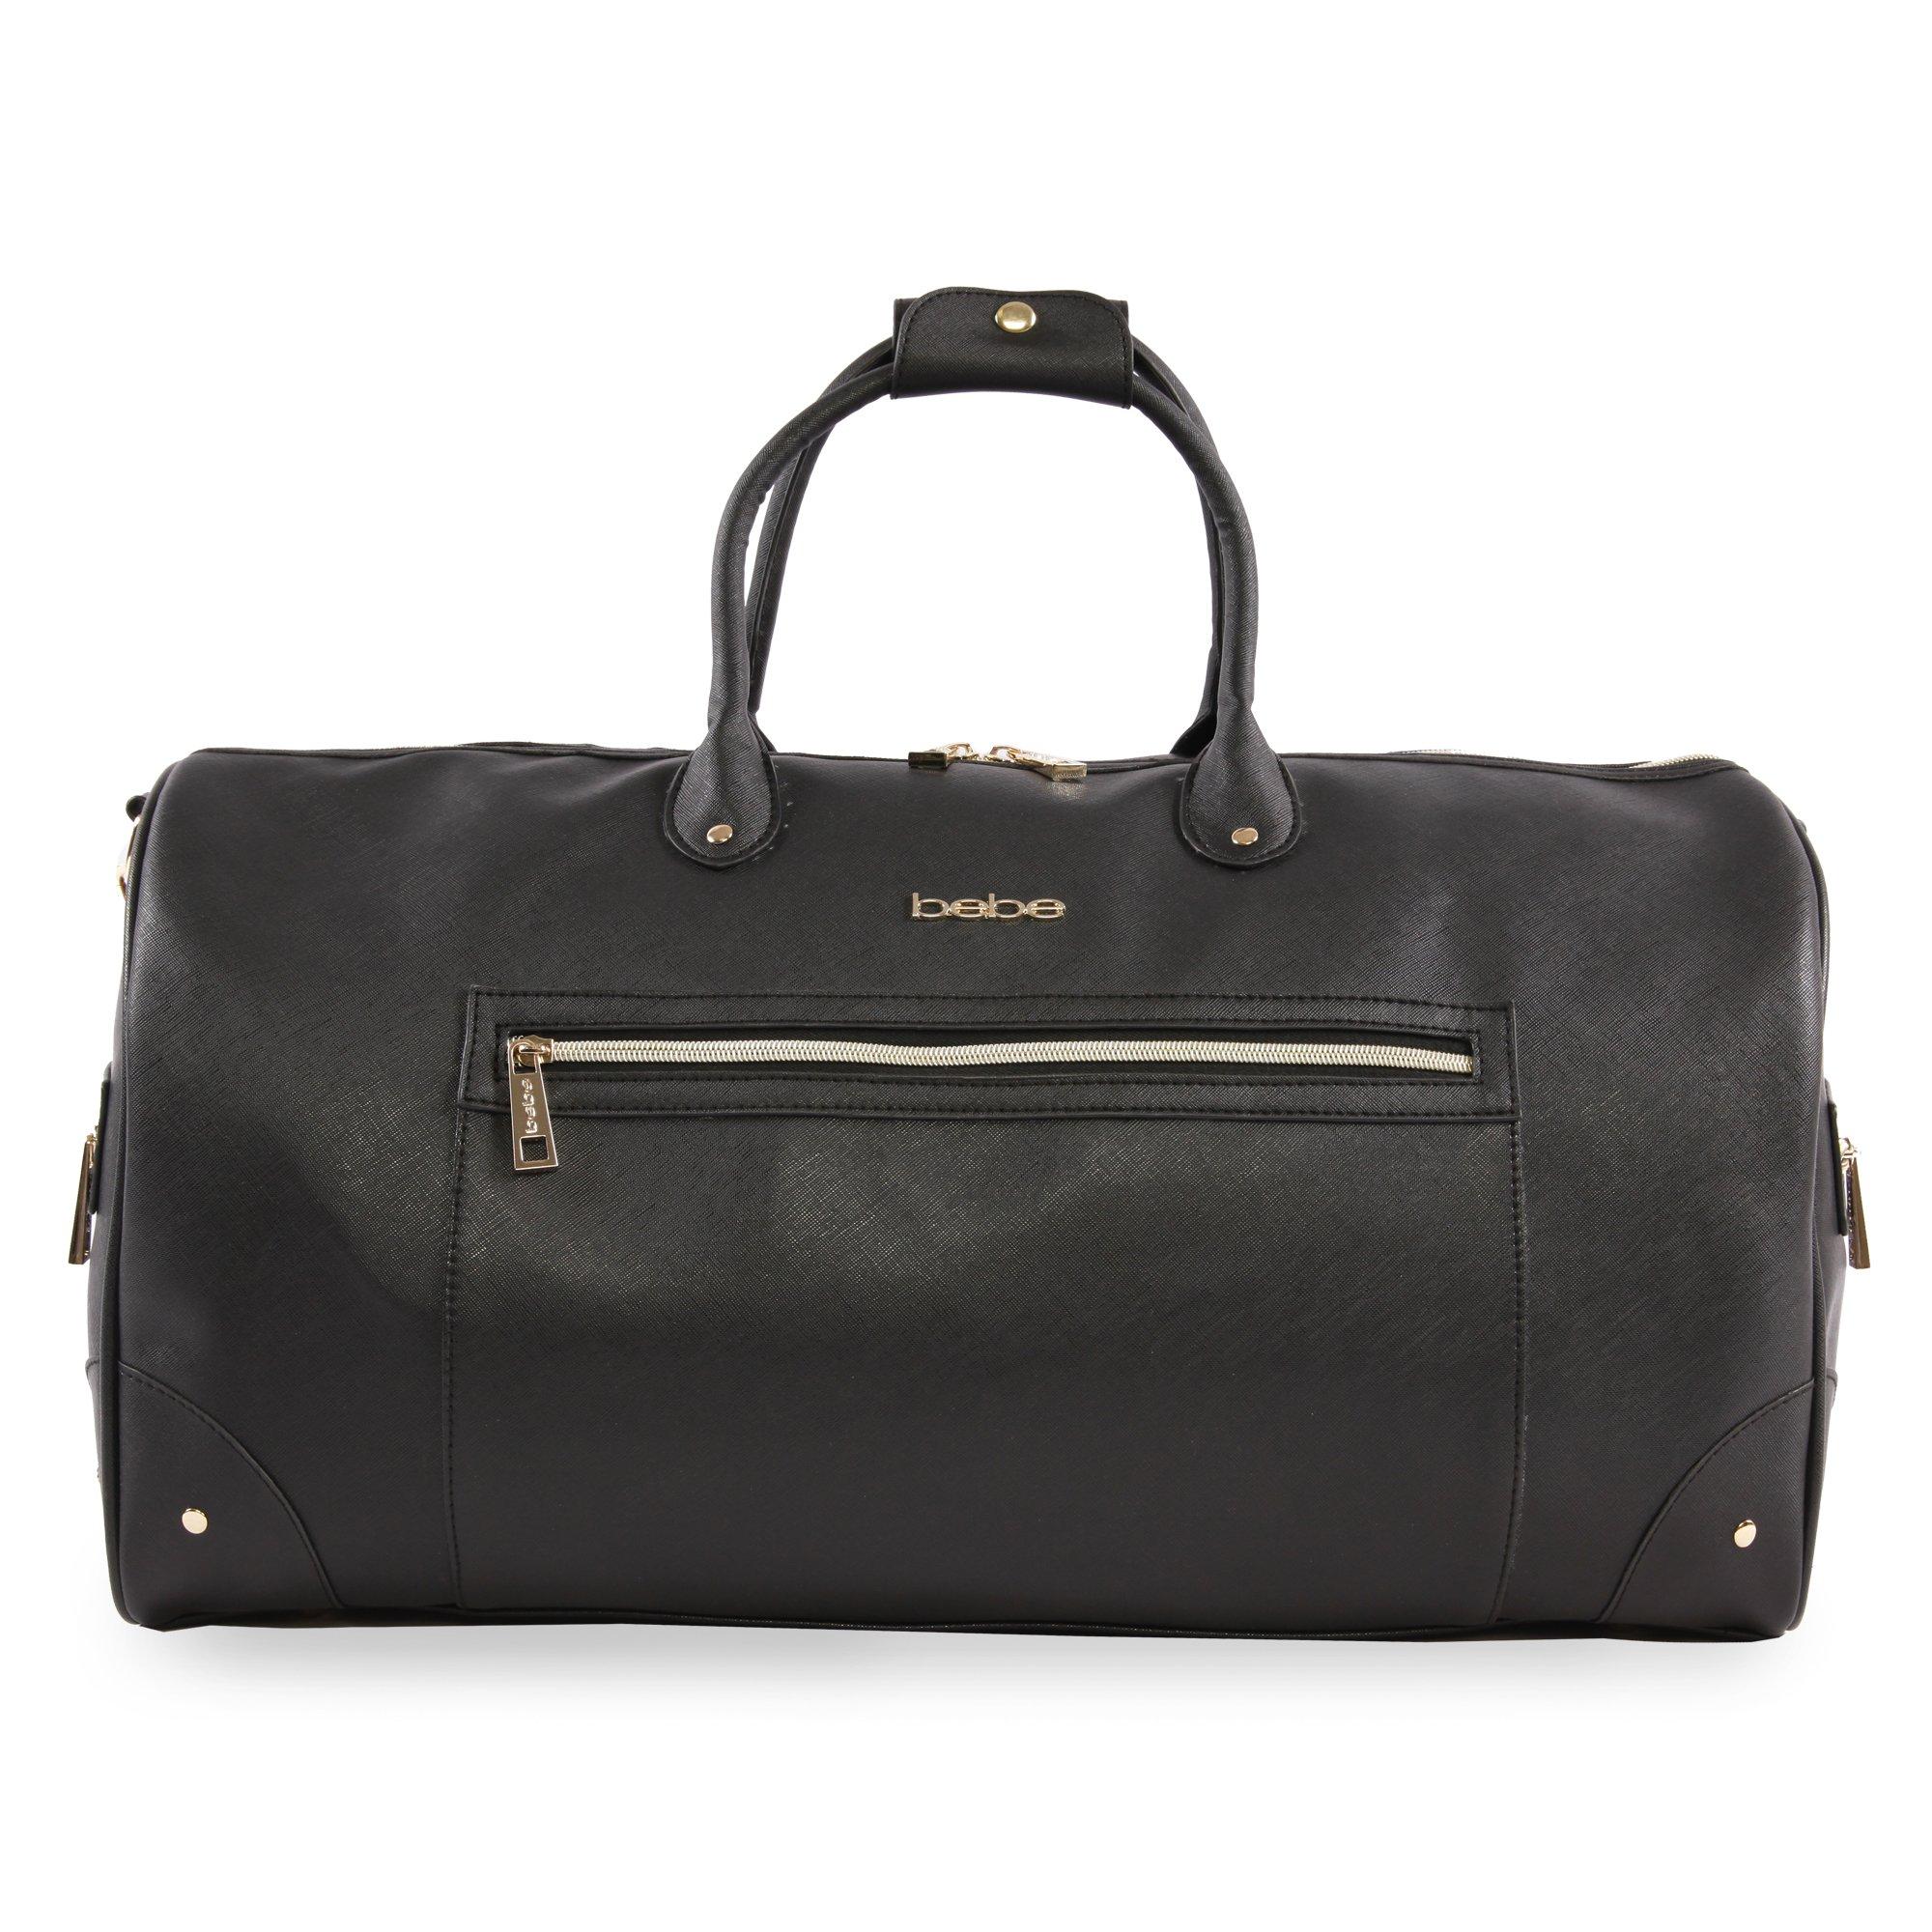 BEBE Women's Demi Travel Weekender Bag, Black, One Size